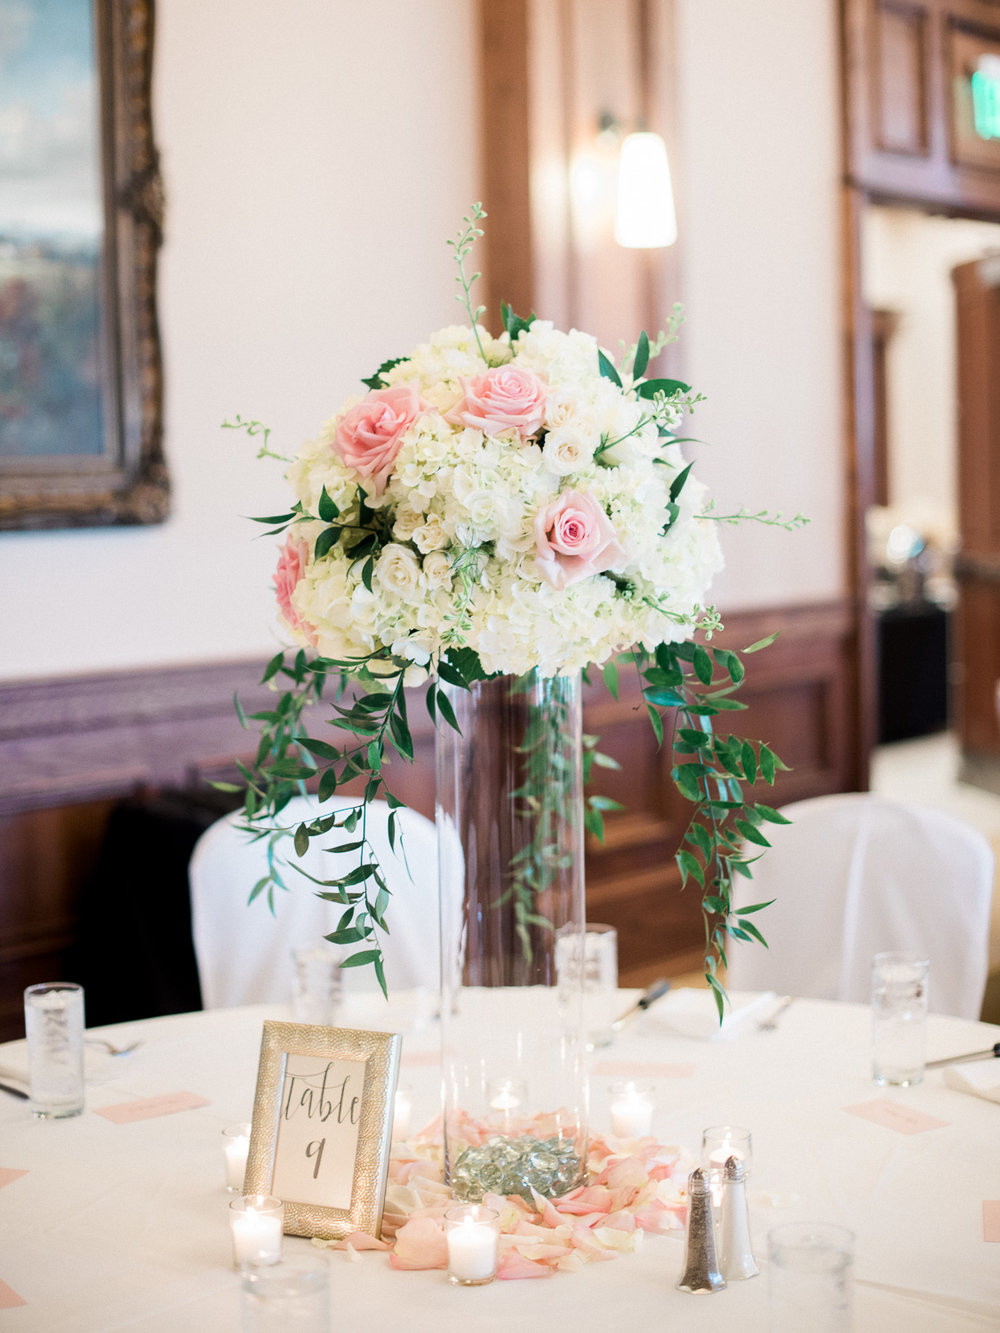 alexgreg-wedding-detailsreception-christinadavisphoto05.jpg